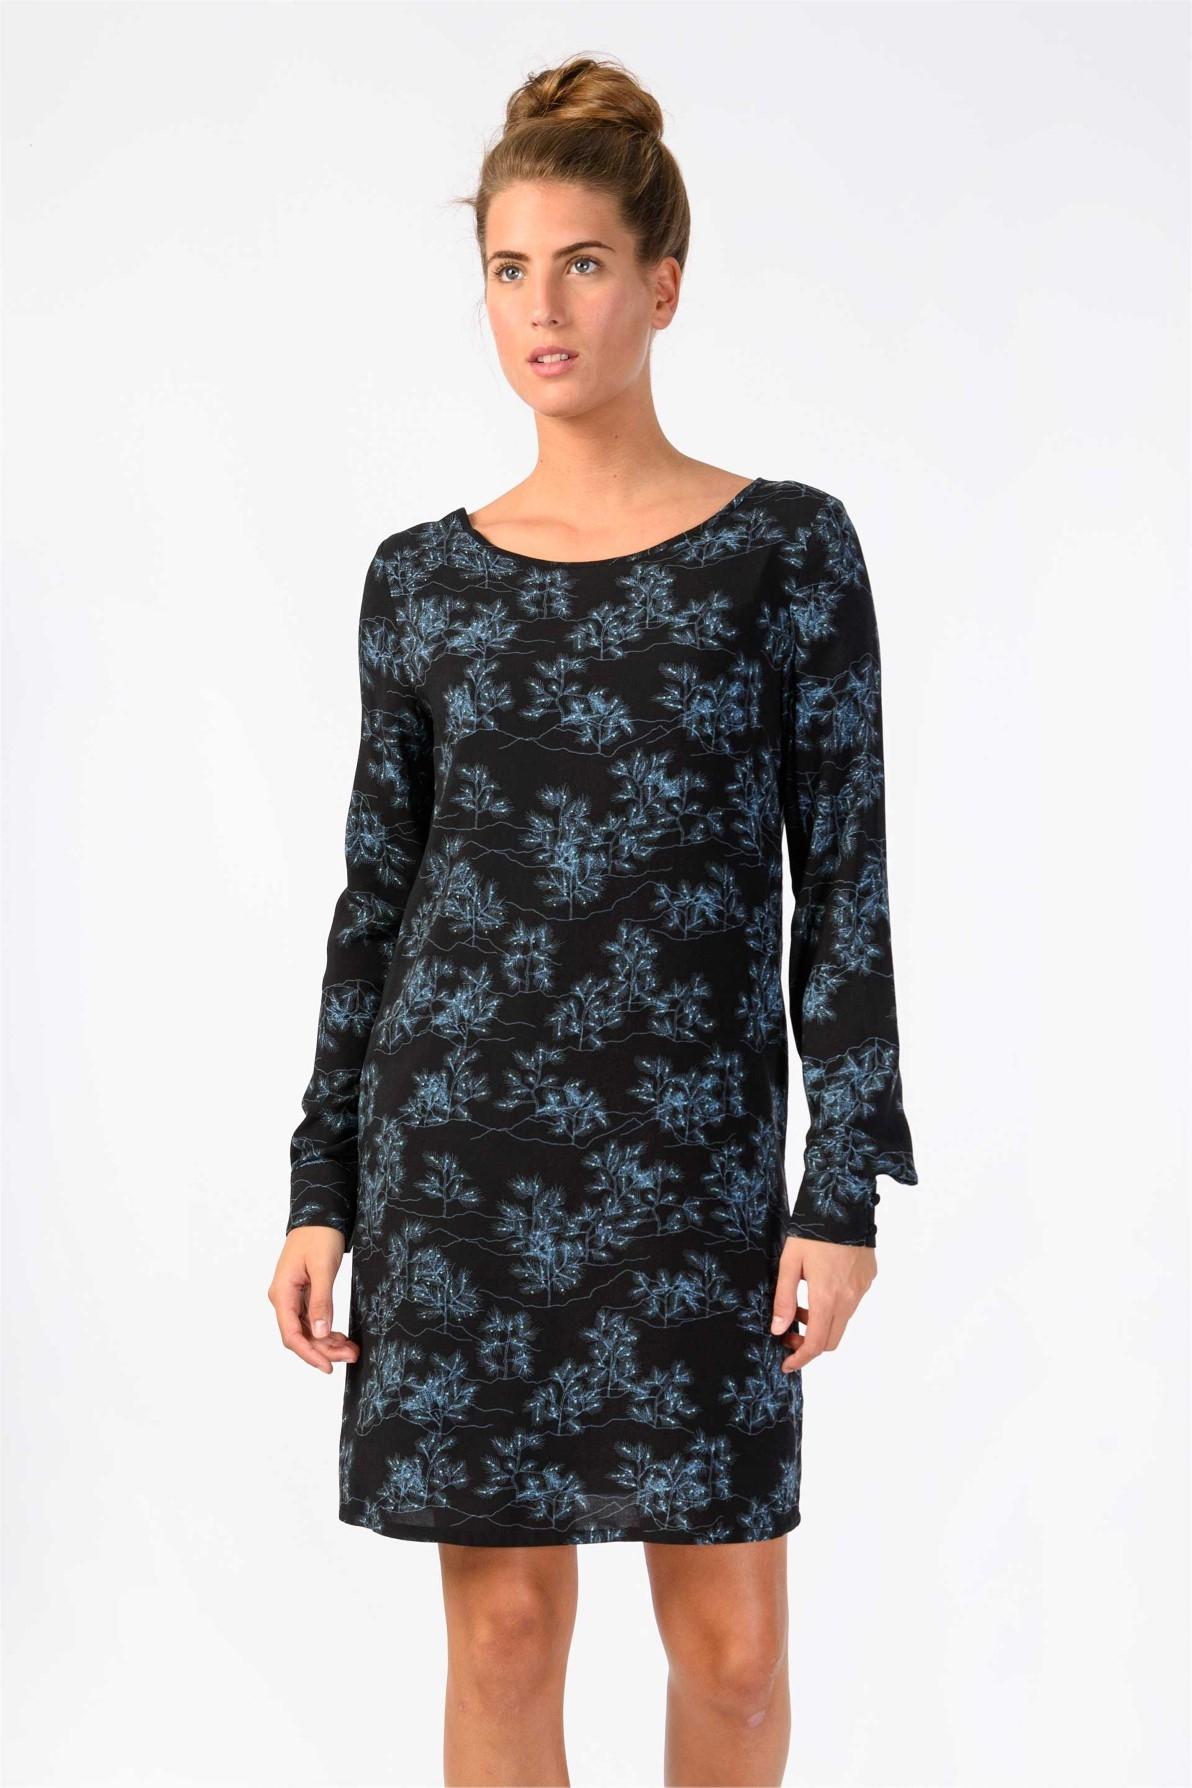 Skunkfunk jurk silbe zwart